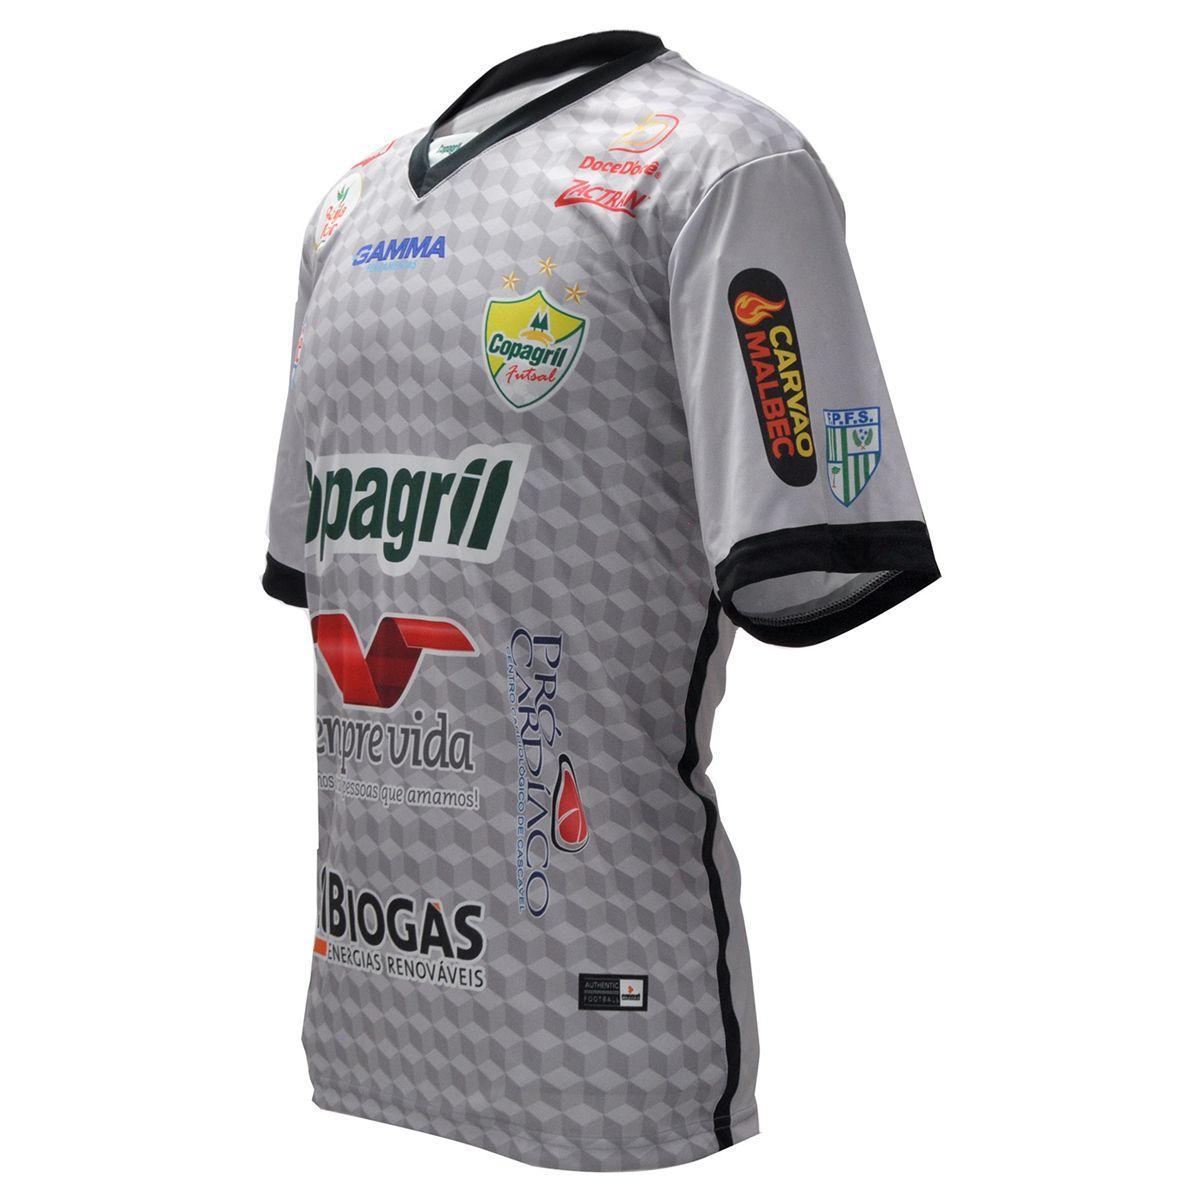 Camisa Oficial Copagril Futsal 2018 Goleiro Cinza - Camisa de Time ... 7563e4f18bea2